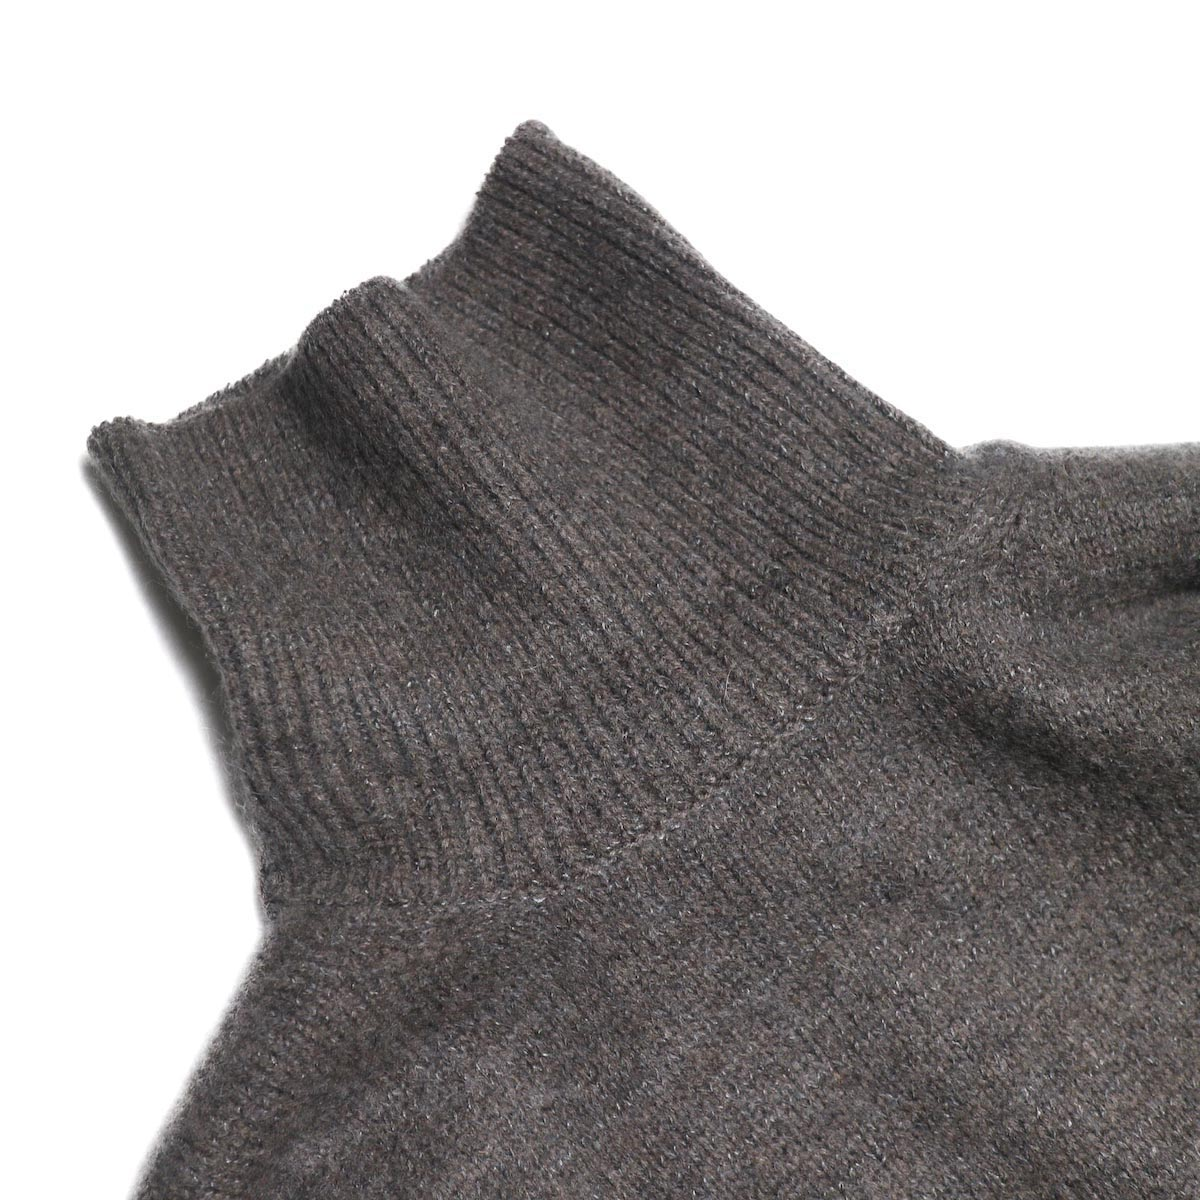 blurhms / Silk Mohair Wool Knit Turtle-Neck P/O (H.Brown) タートルネック